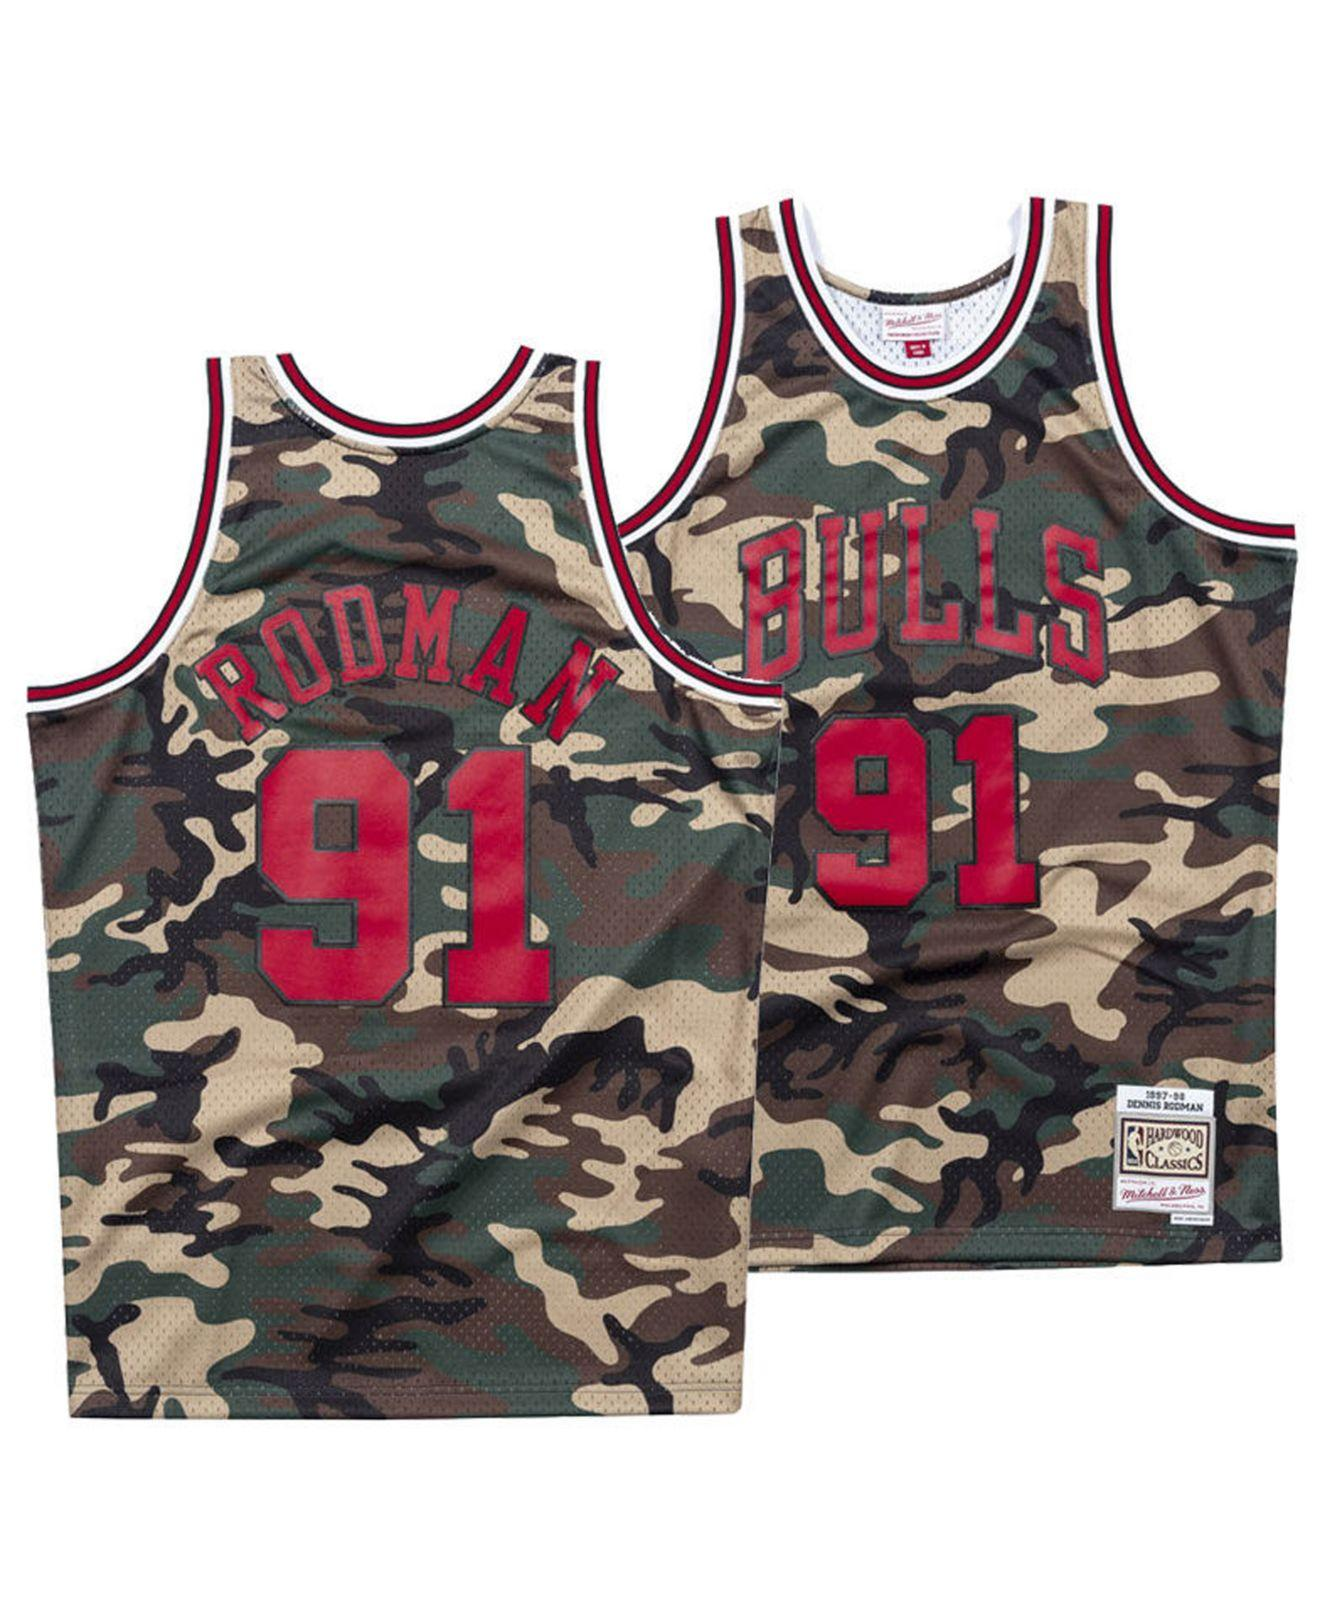 3f54e689a Mitchell & Ness Dennis Rodman Chicago Bulls Woodland Camo Swingman ...